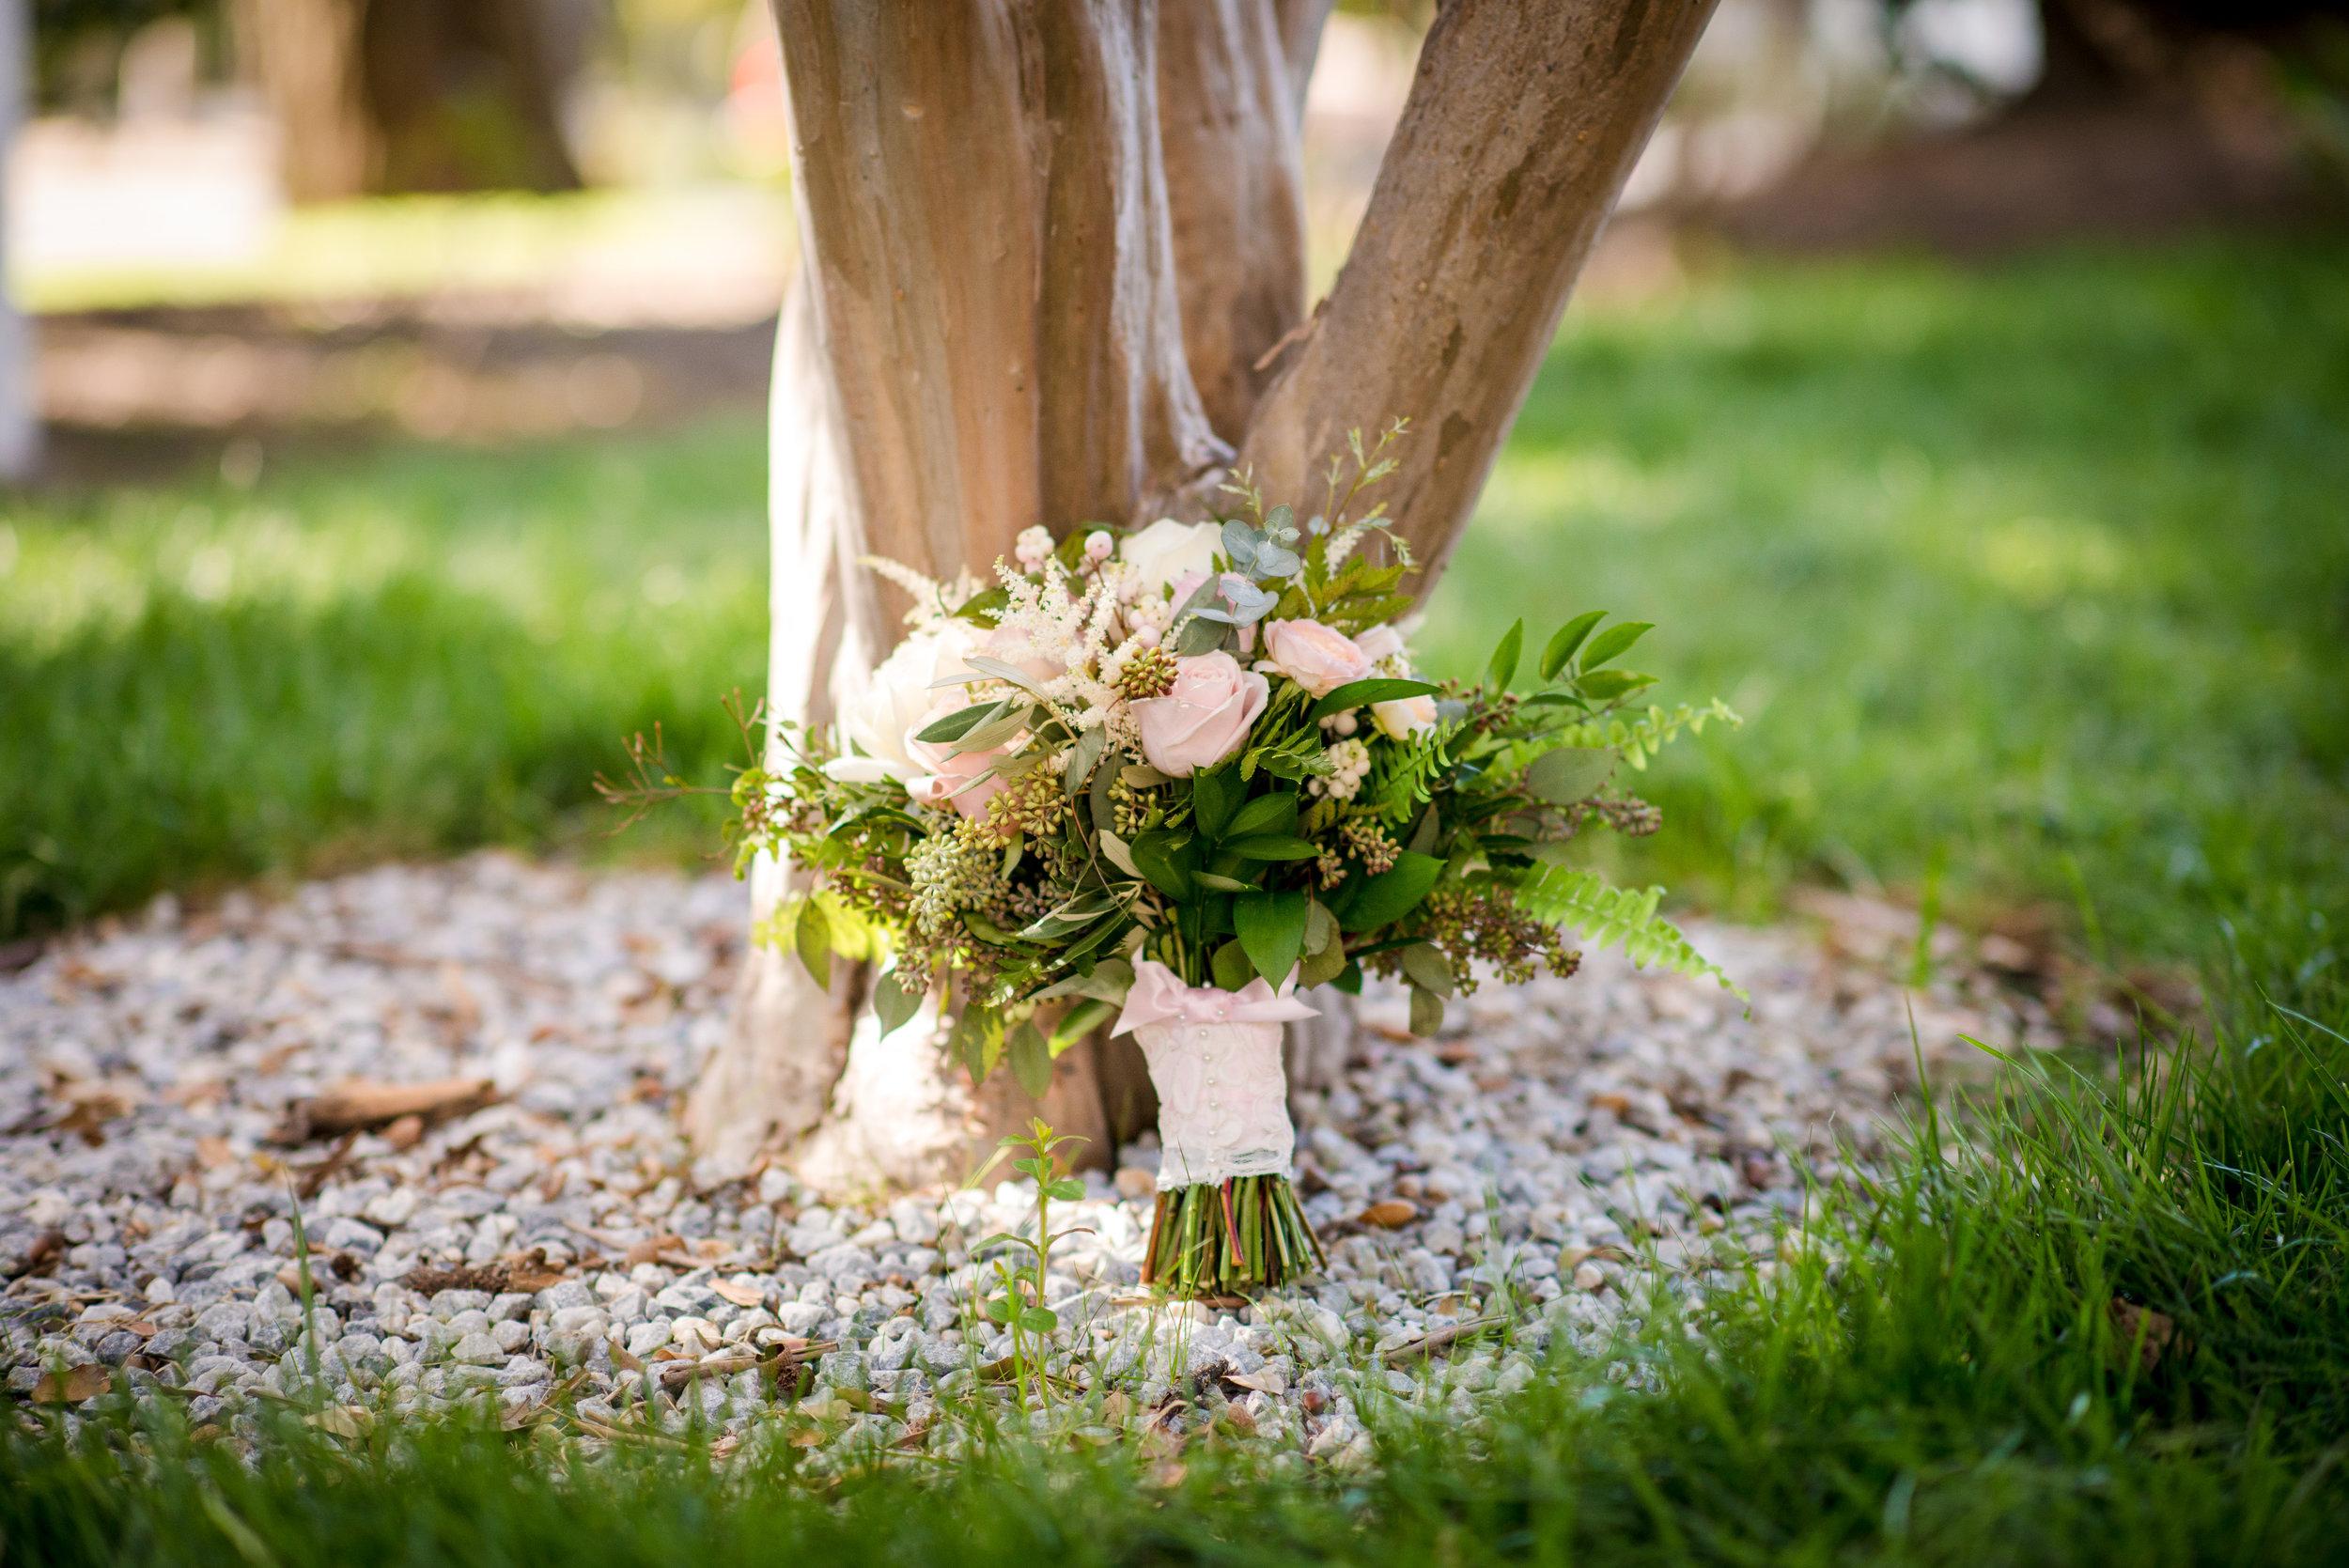 Bridal_Bouquet_Blush_Pink_Garden_Roses_Vizcaya_Sacramento_Violette_Fleurs.jpg